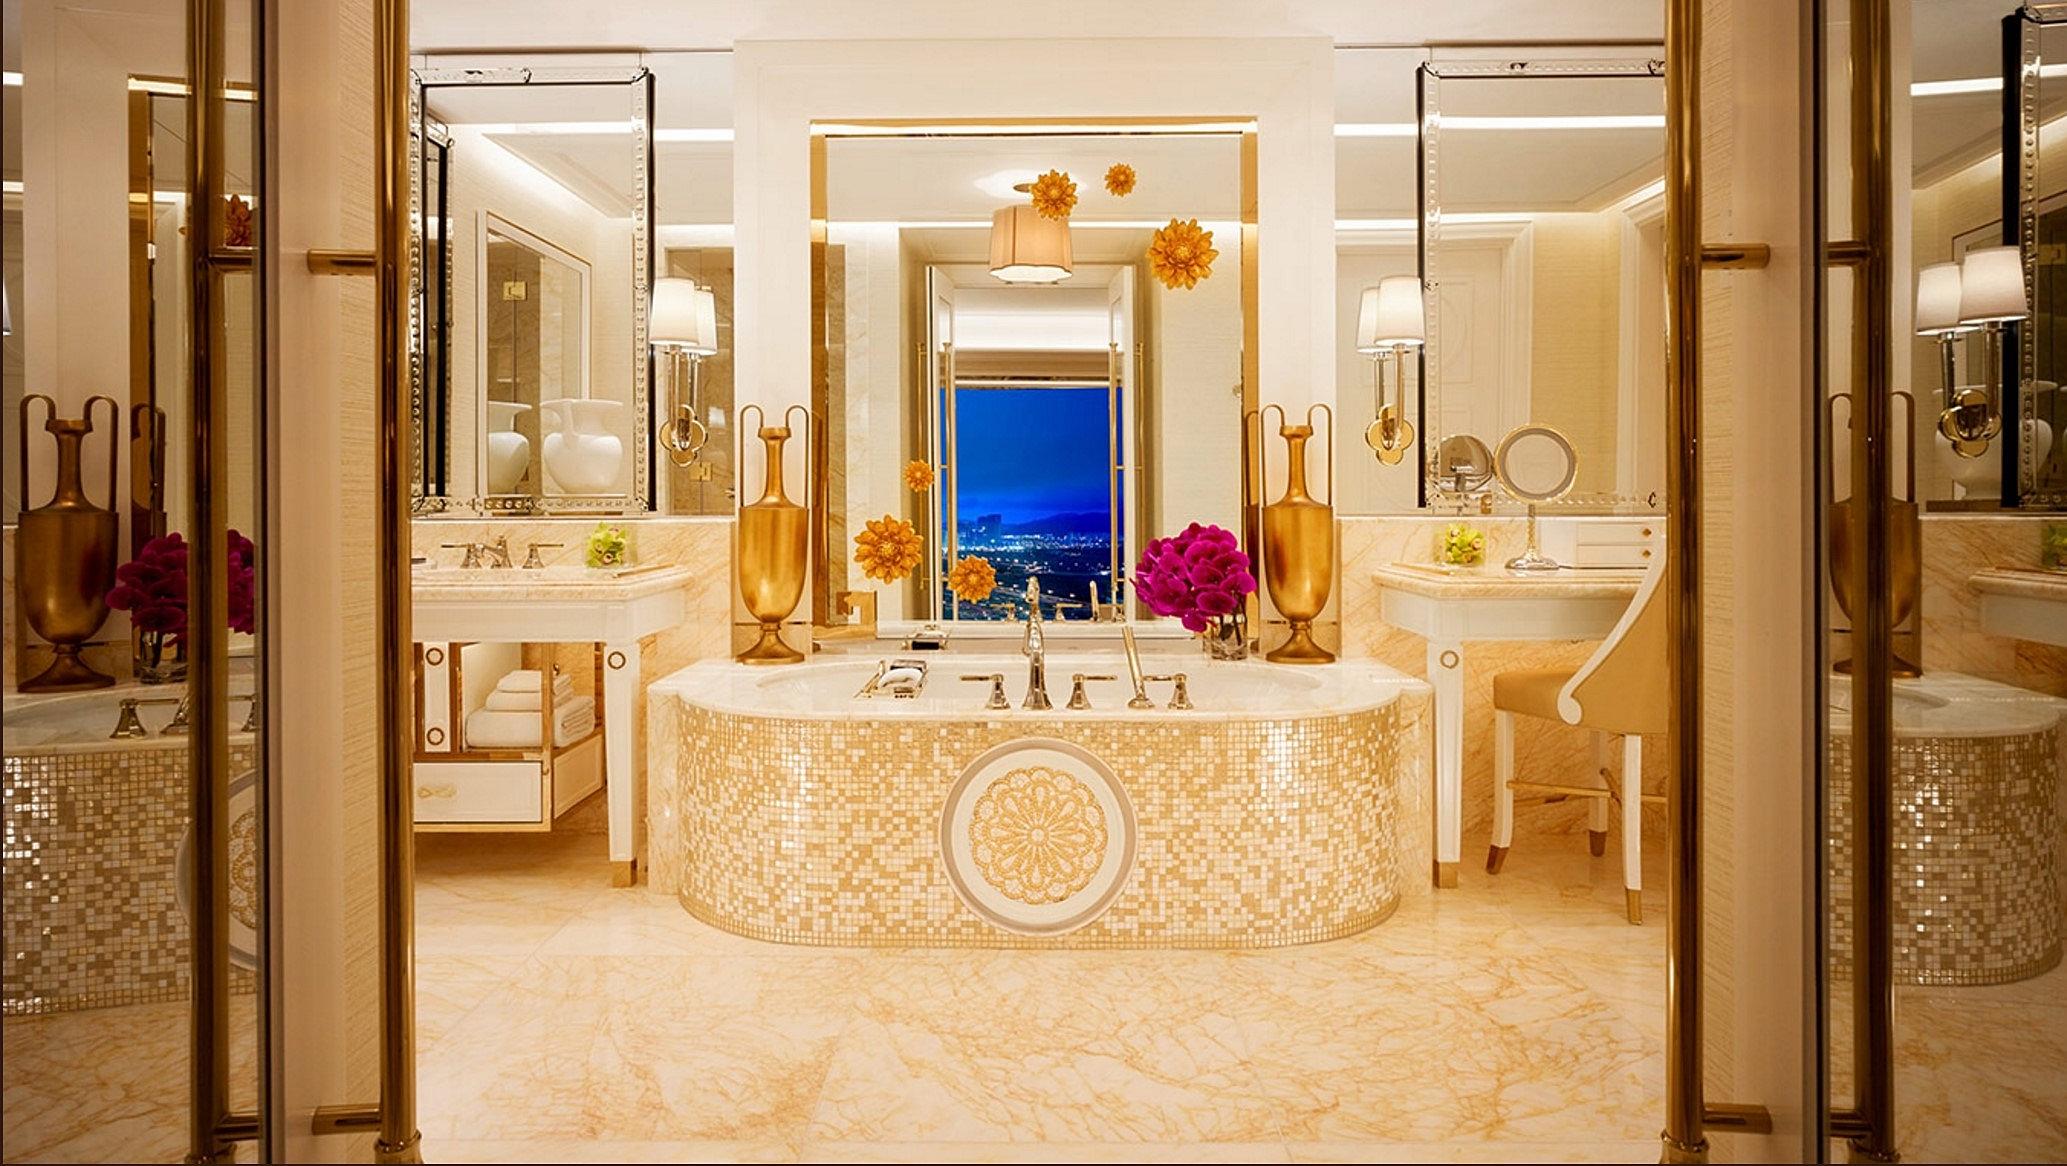 Bathroom Remodel Las Vegas Bathroom Tile Las Vegas Leisure